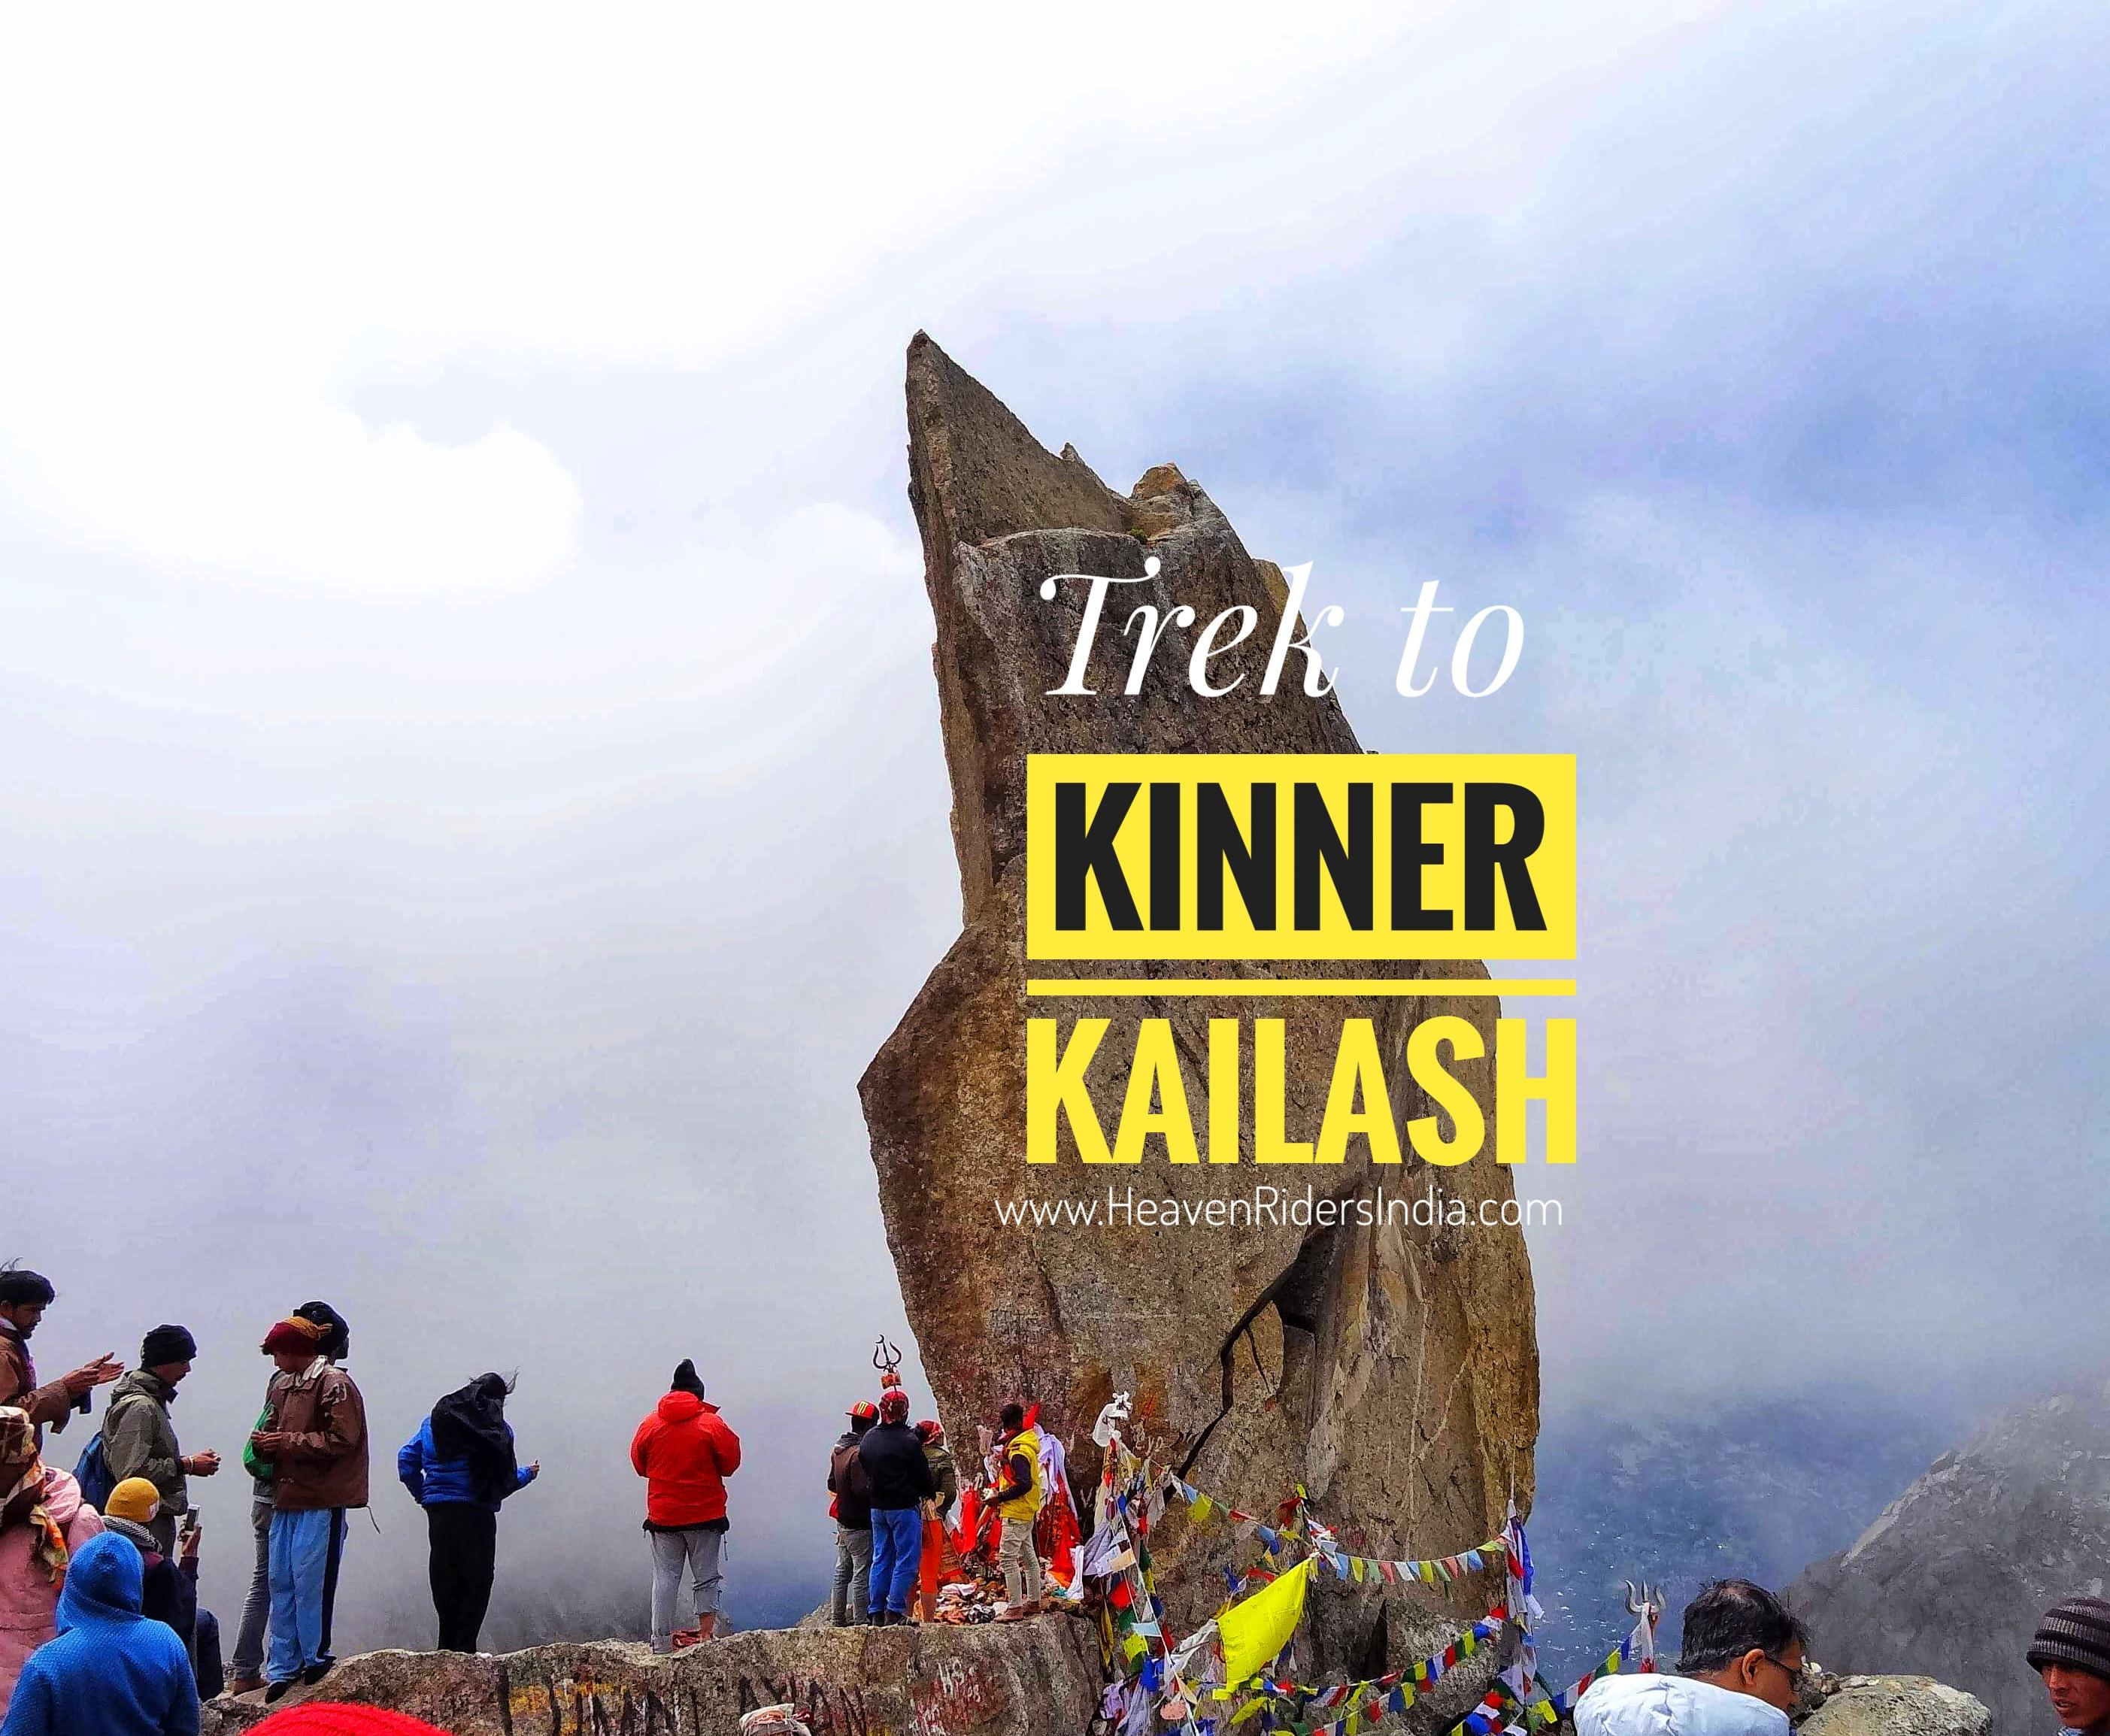 Kinner-Kailash, Heaven Riders India